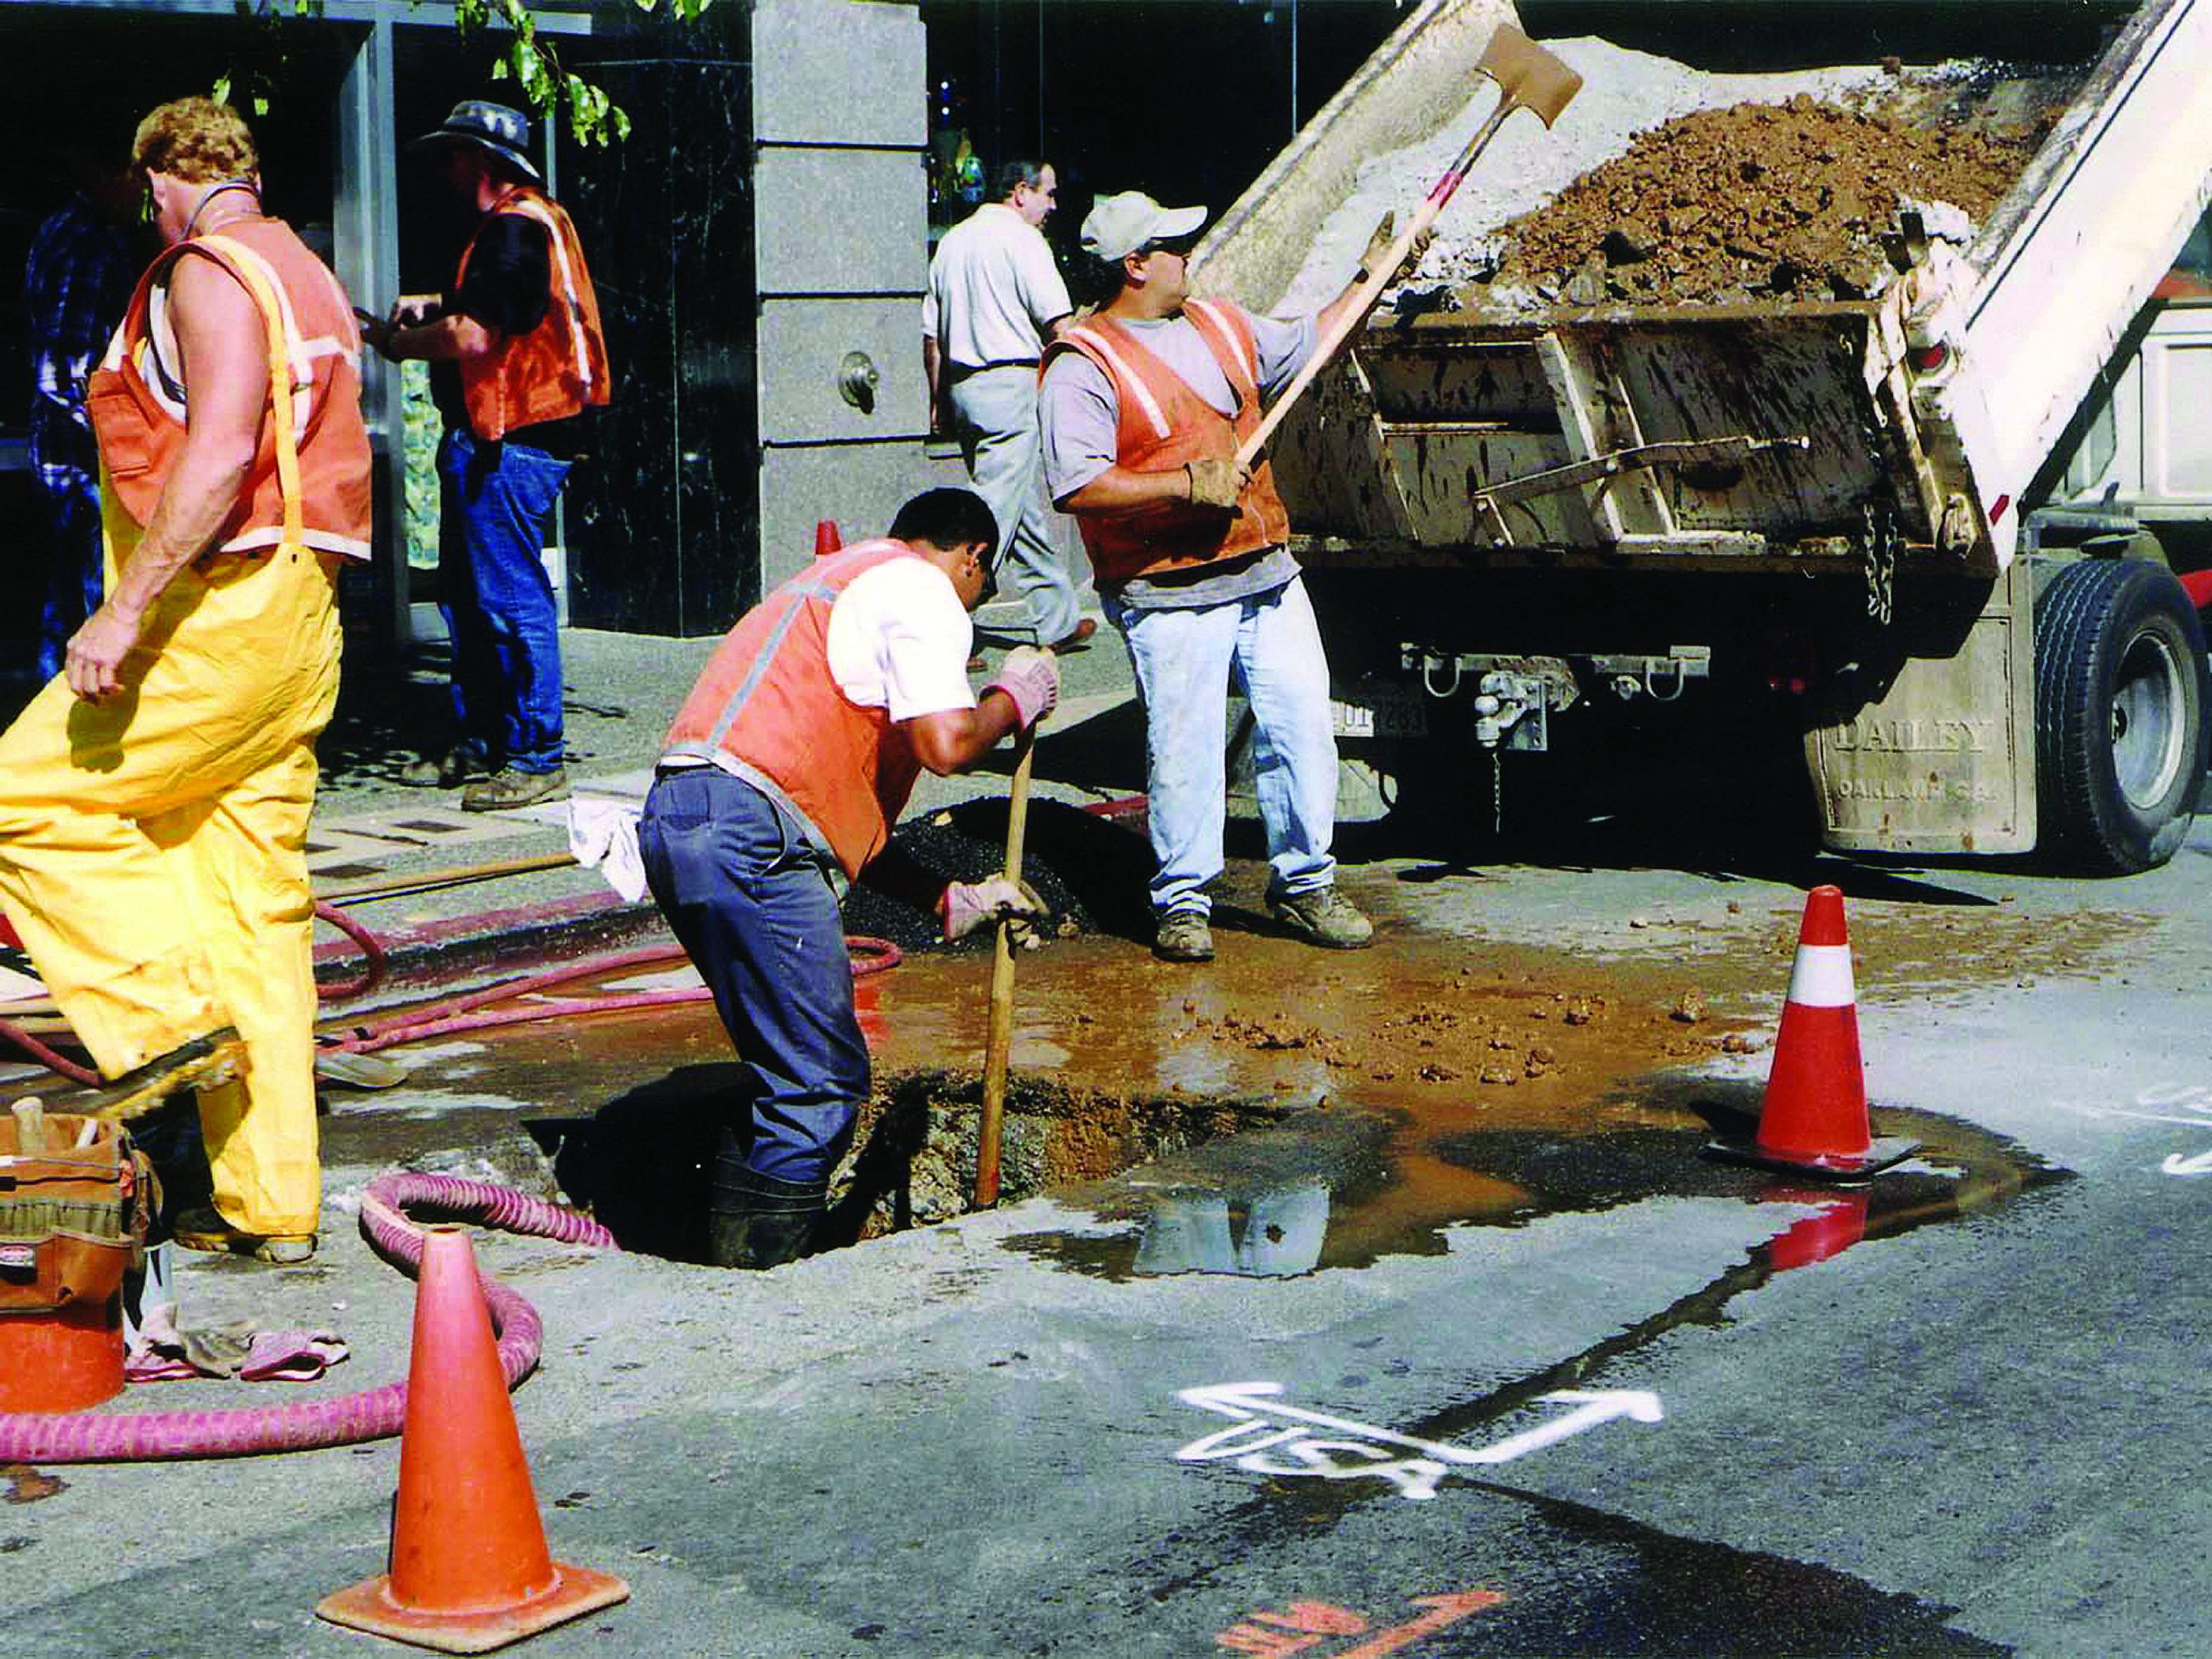 SubSurface Locators Pollard Water leak detection